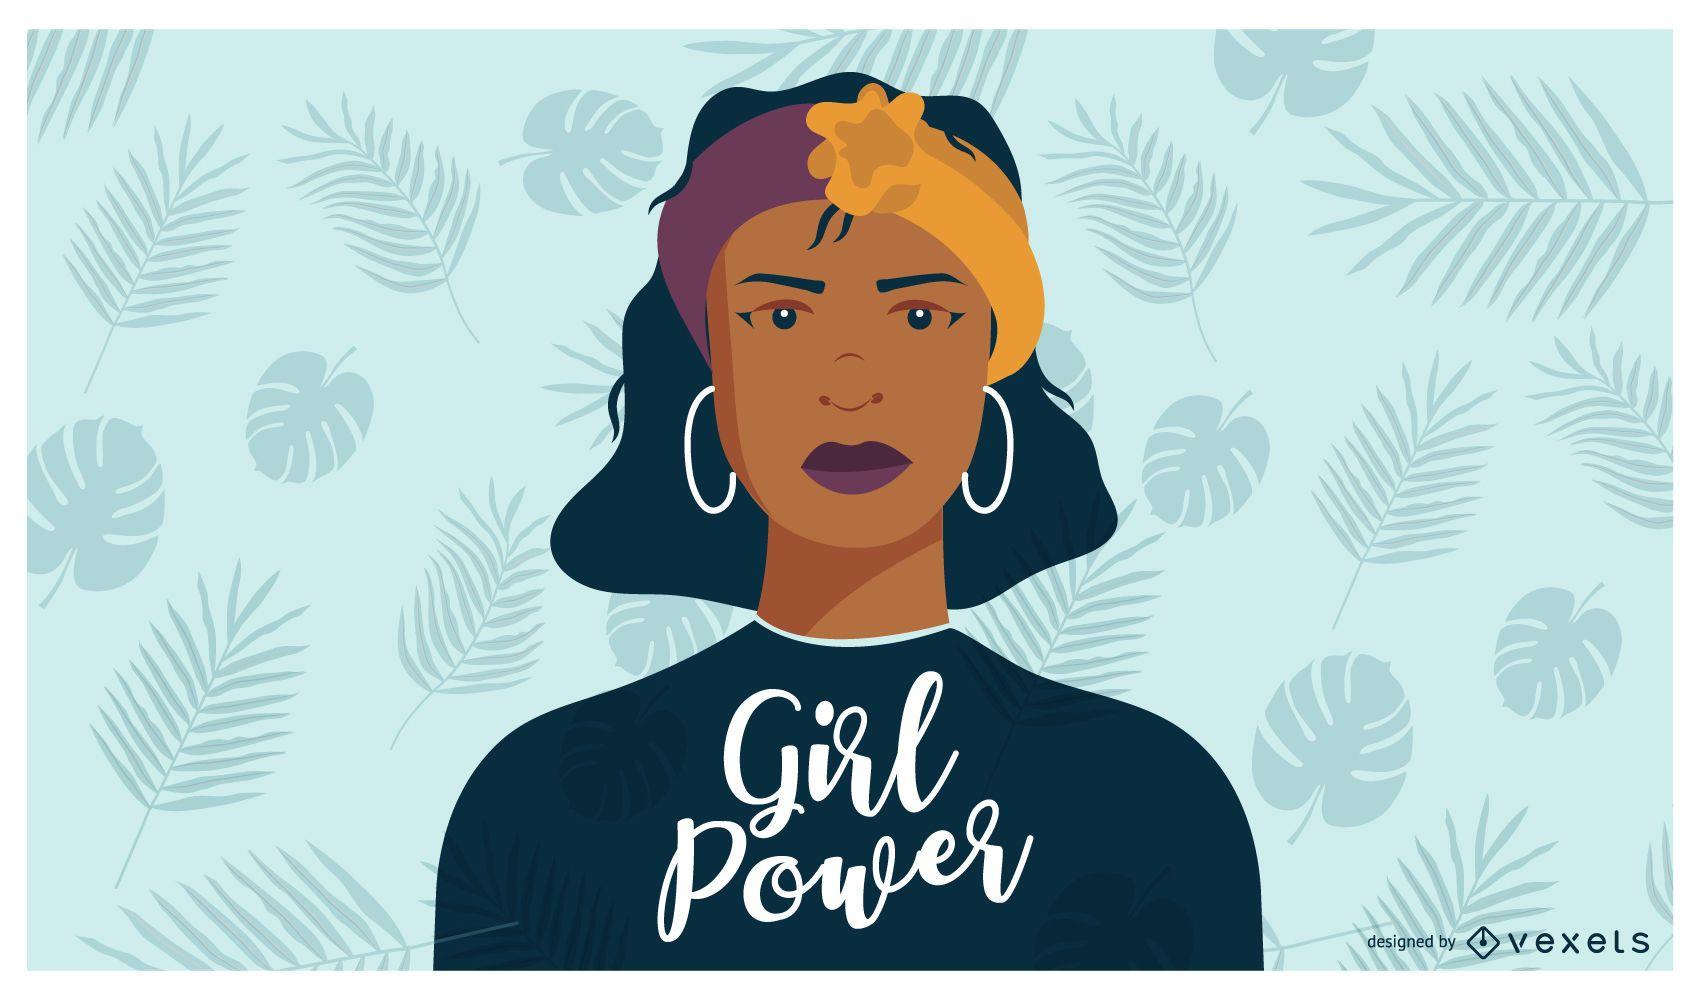 Girl Power Cartoon Illustration